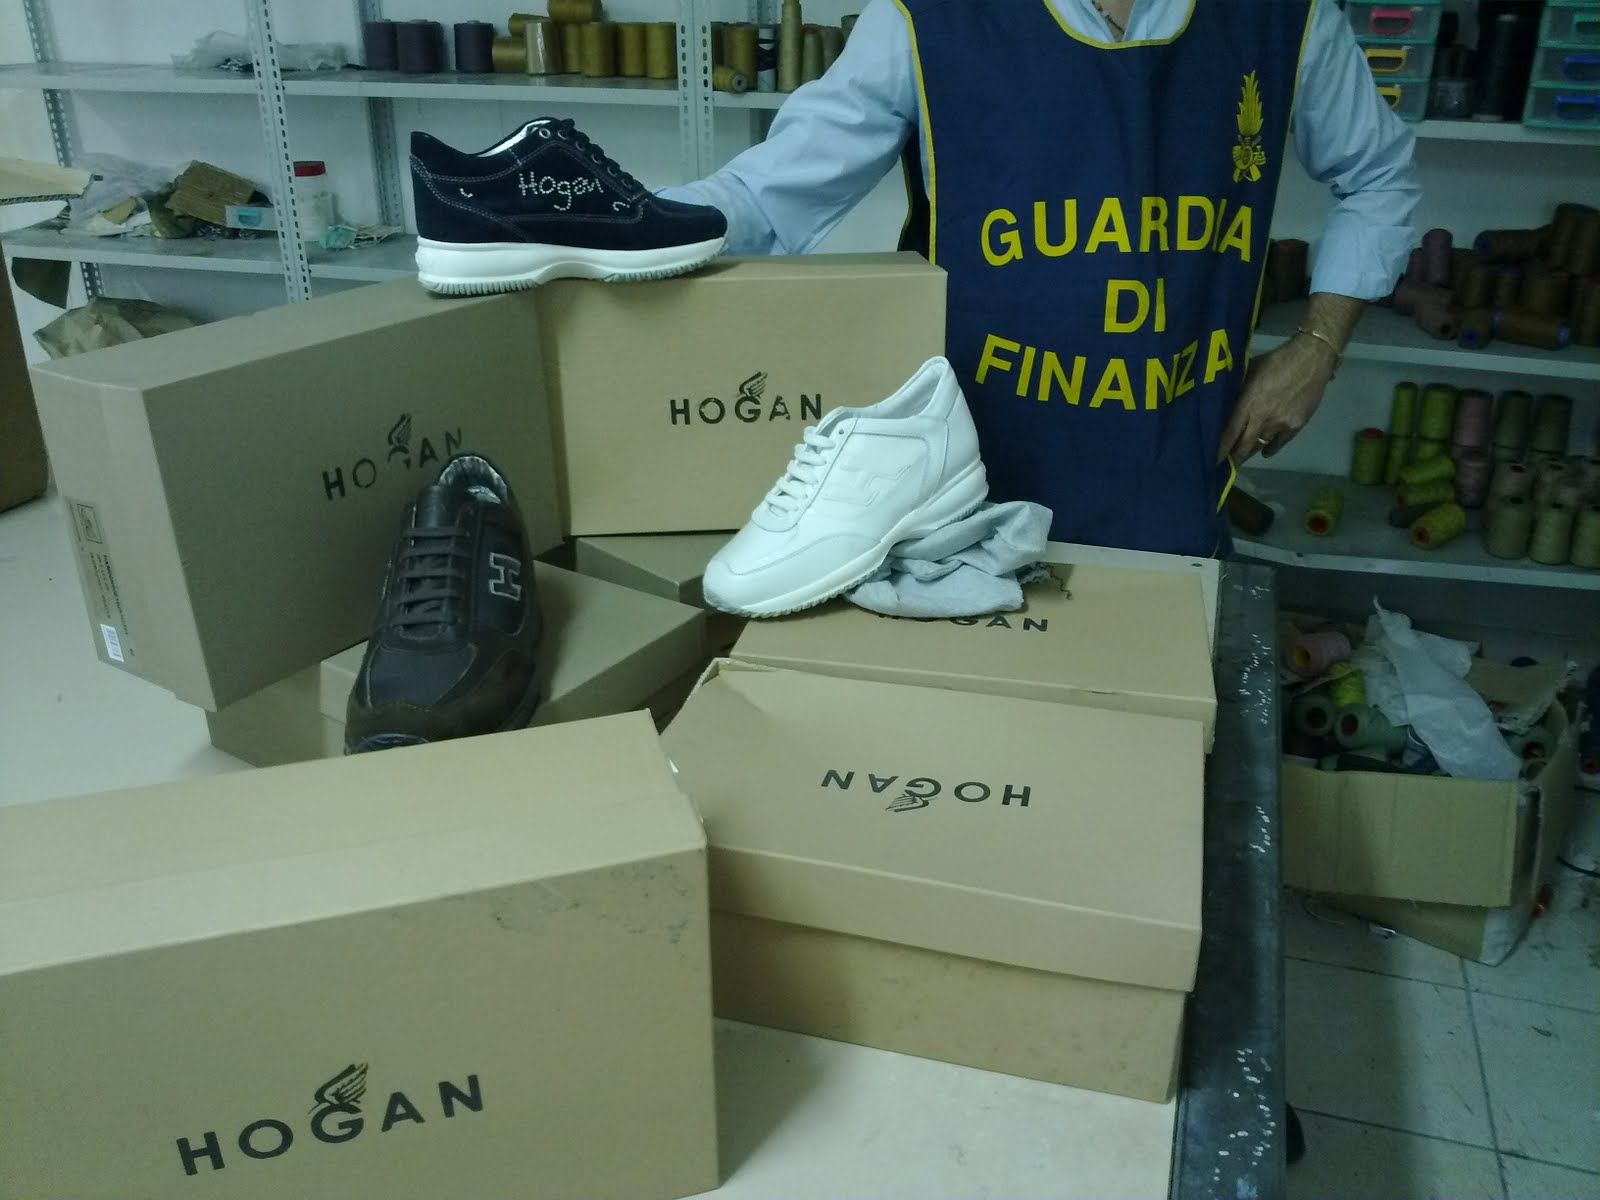 Scarpe Hogan contraffatte